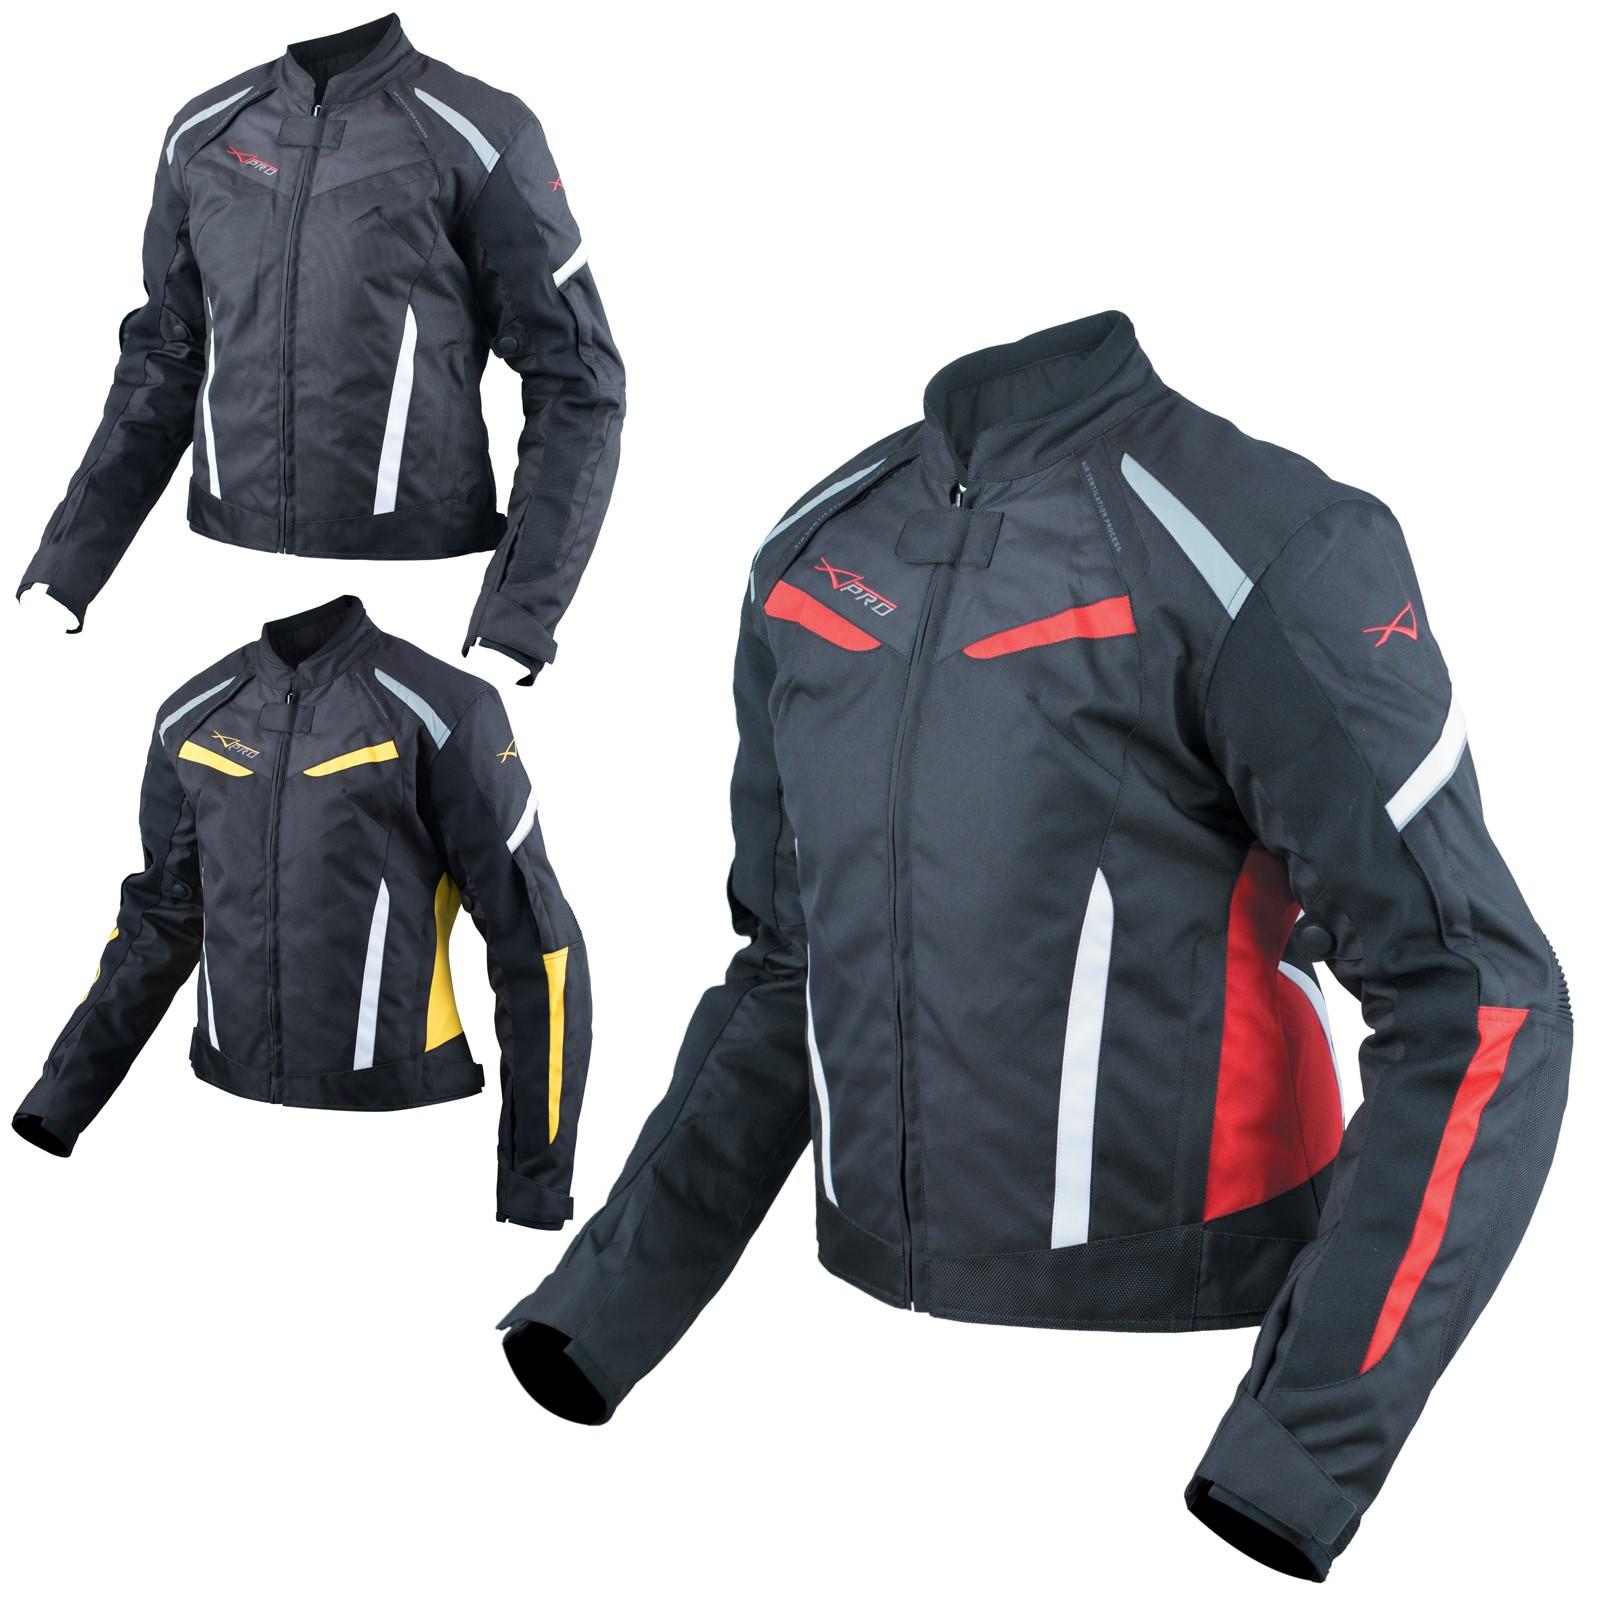 Moto Giacca Donna Sport Impermeabile Impermeabile Tessuto Riflettente